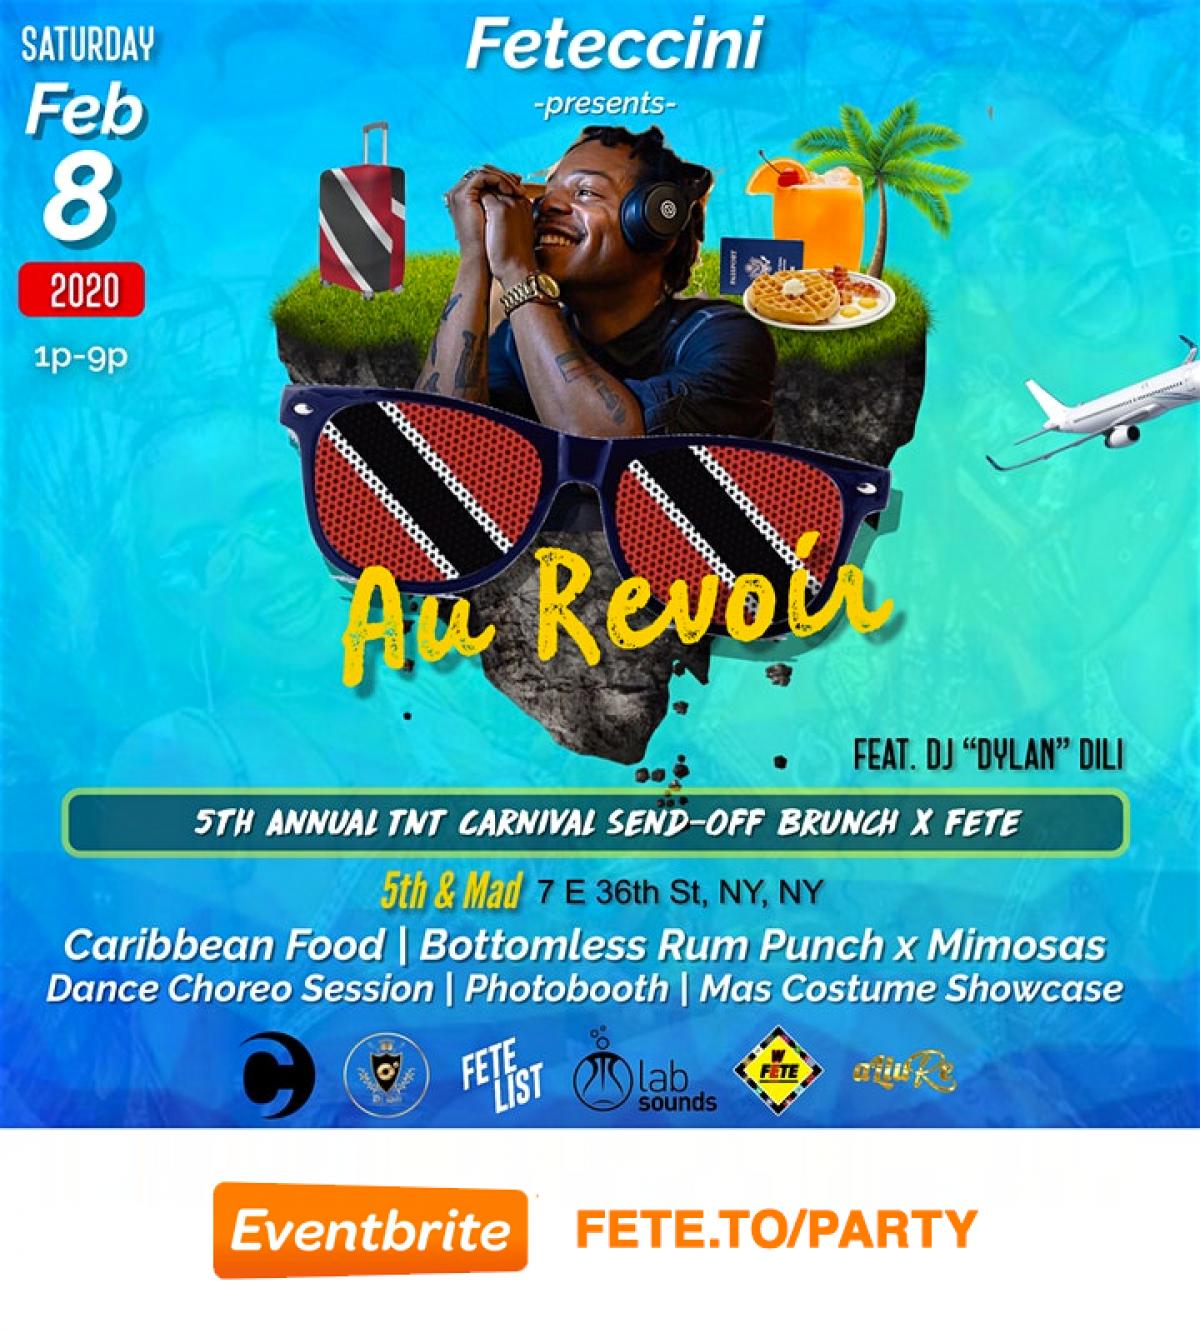 Au Revoir: Brunch + Fete Carnival Send-Off  flyer or graphic.